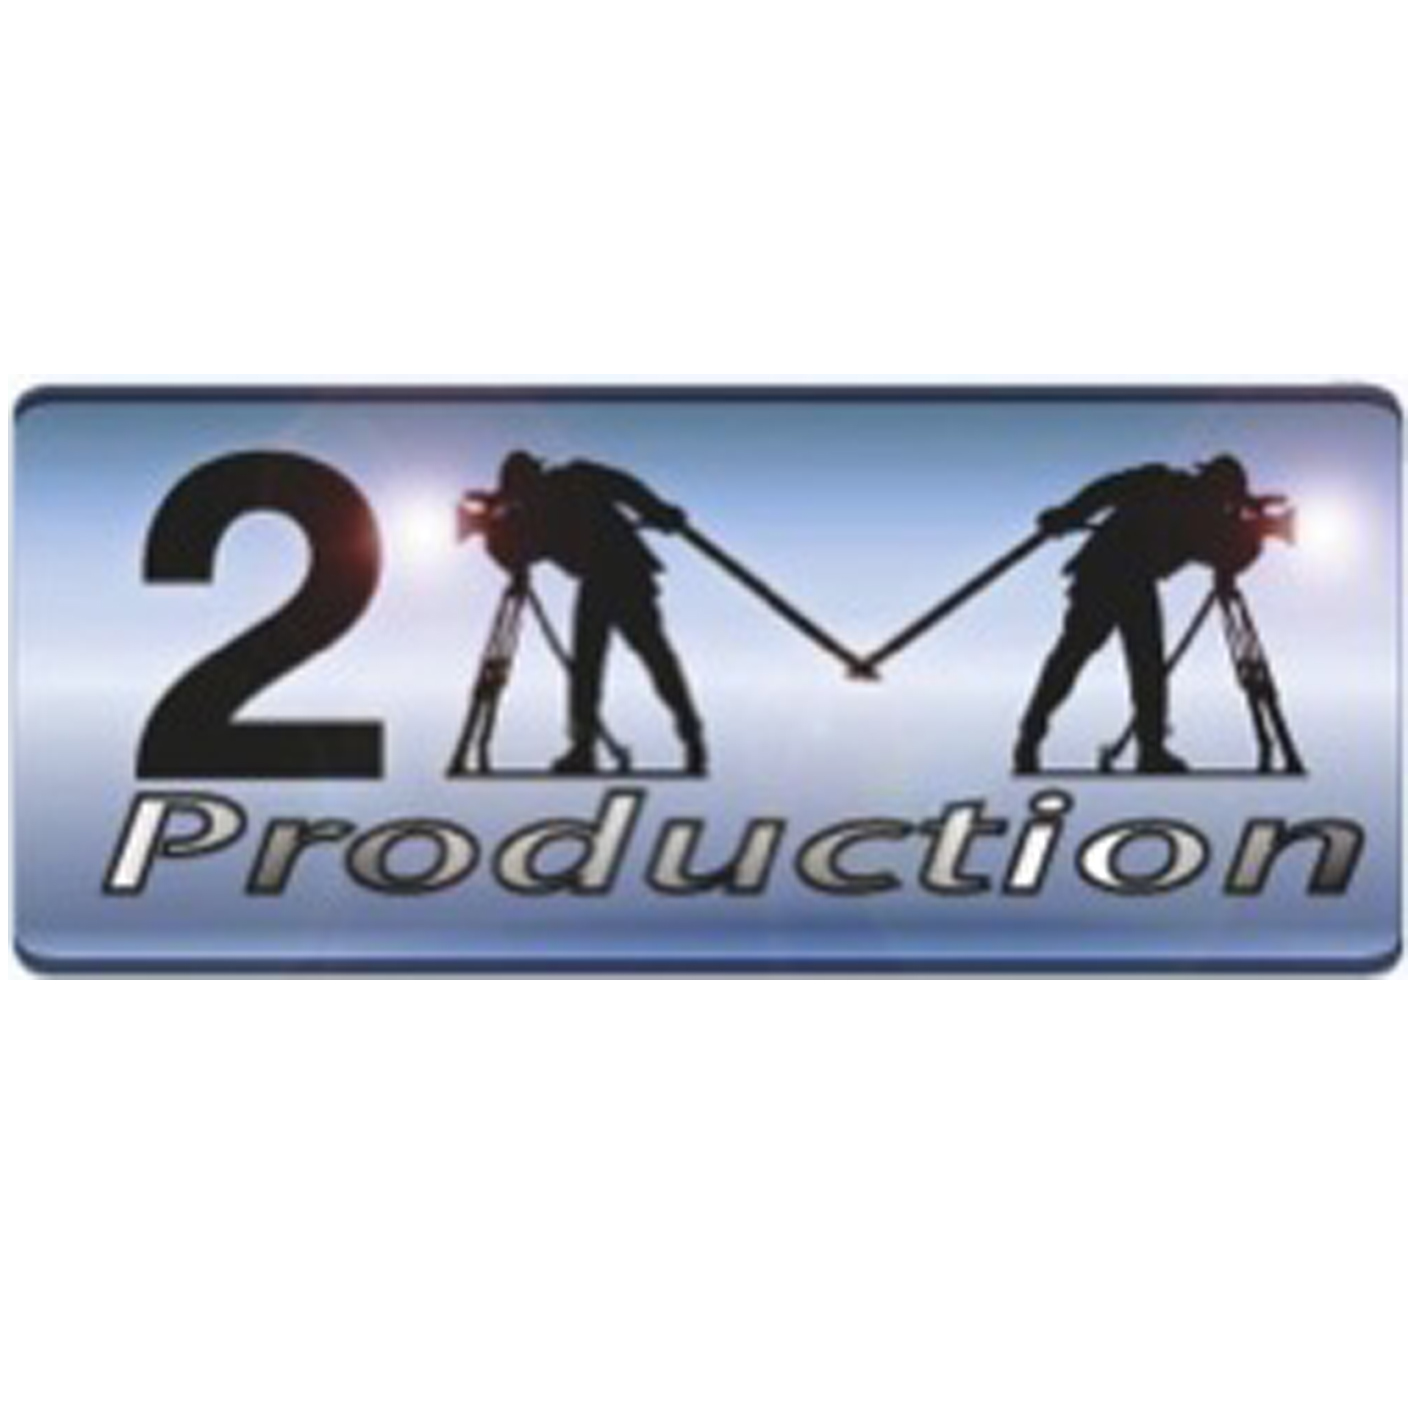 2Mproduction